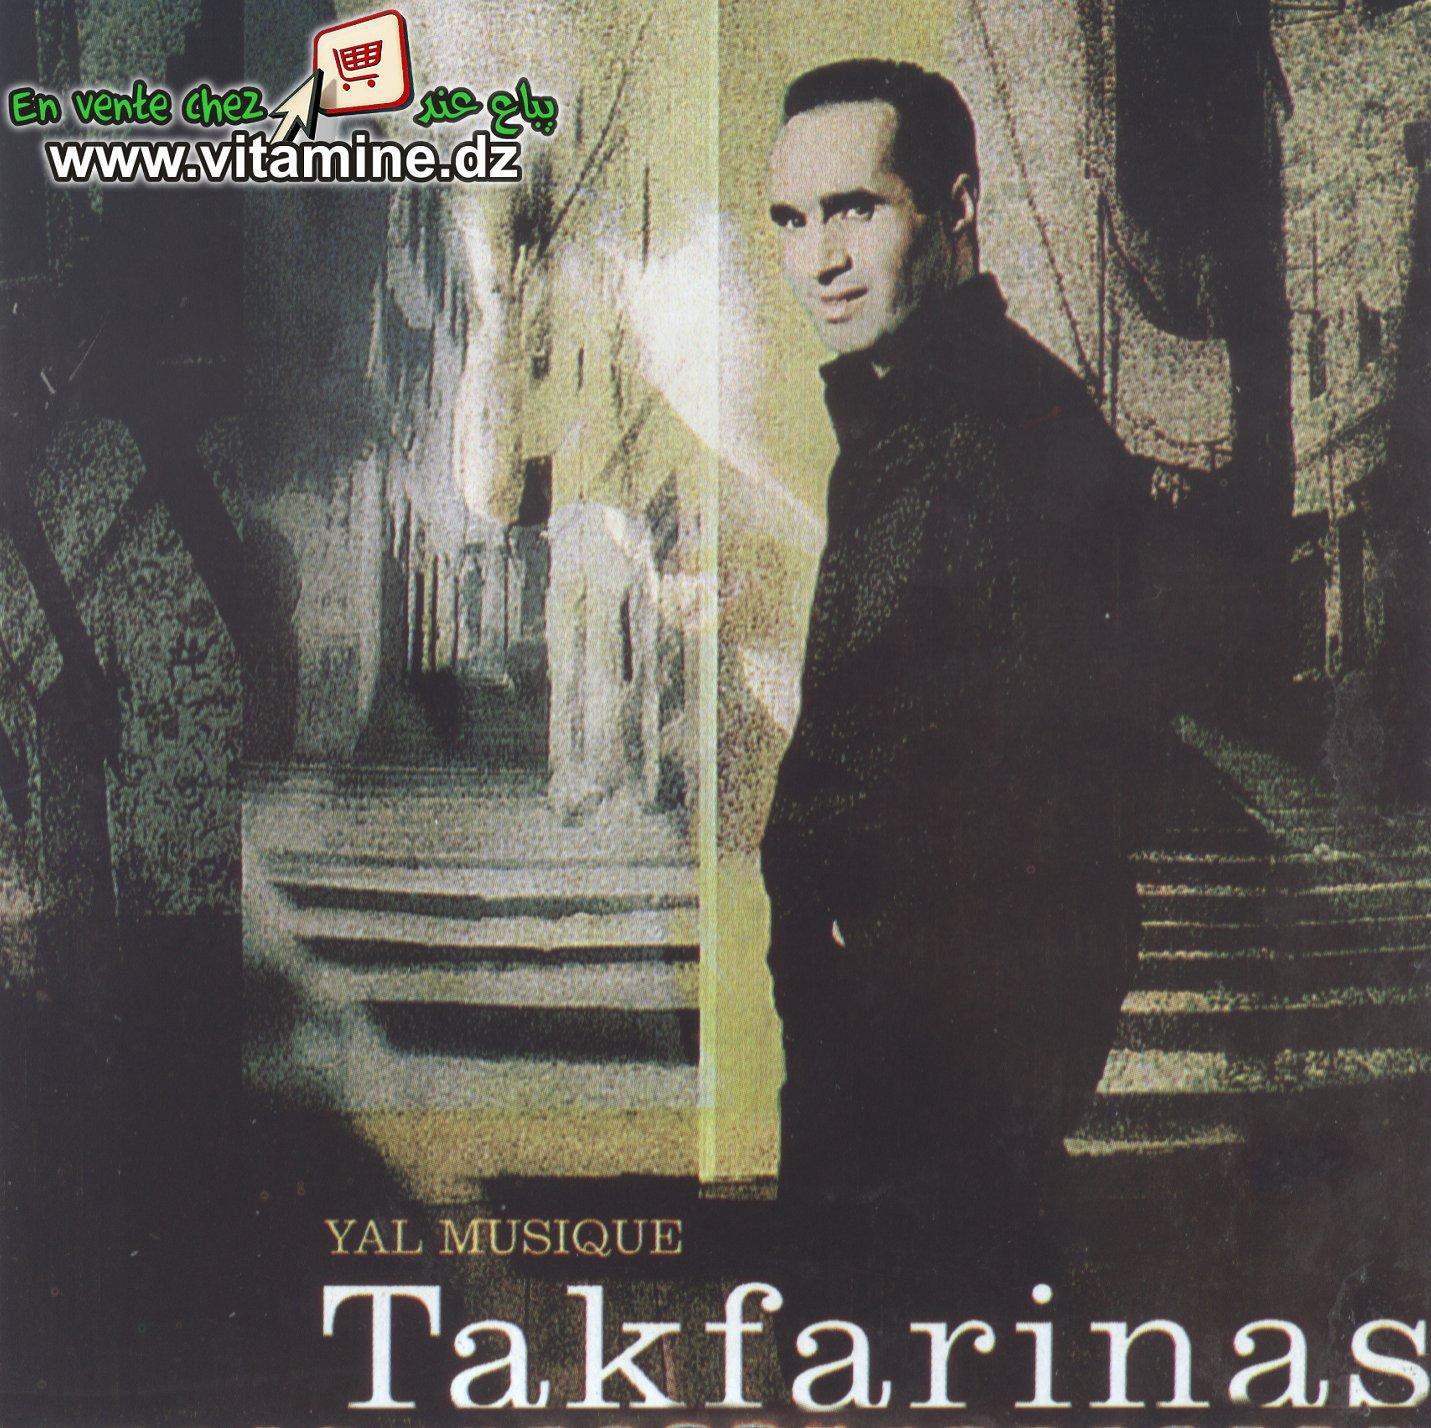 Takfarinas - yal musique